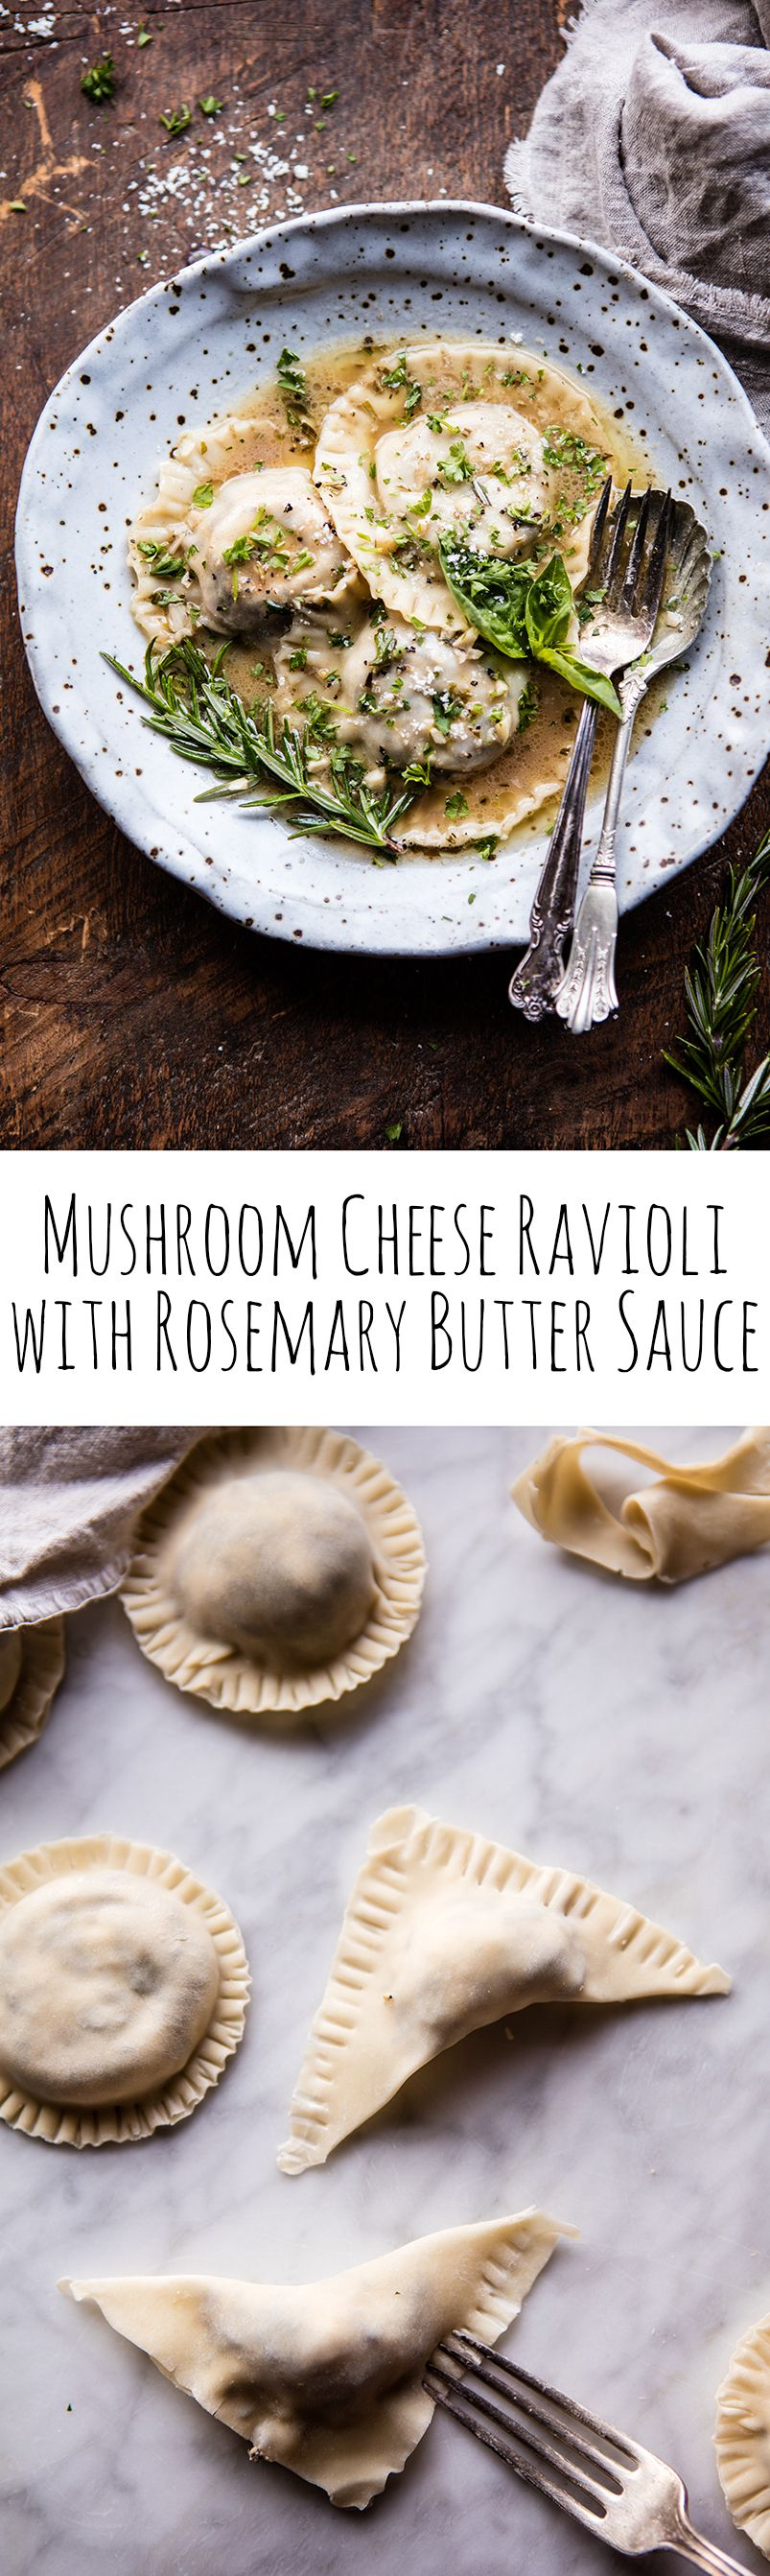 Mushroom Cheese Ravioli with Rosemary Butter Sauce   halfbakedharvest.com @hbharvest